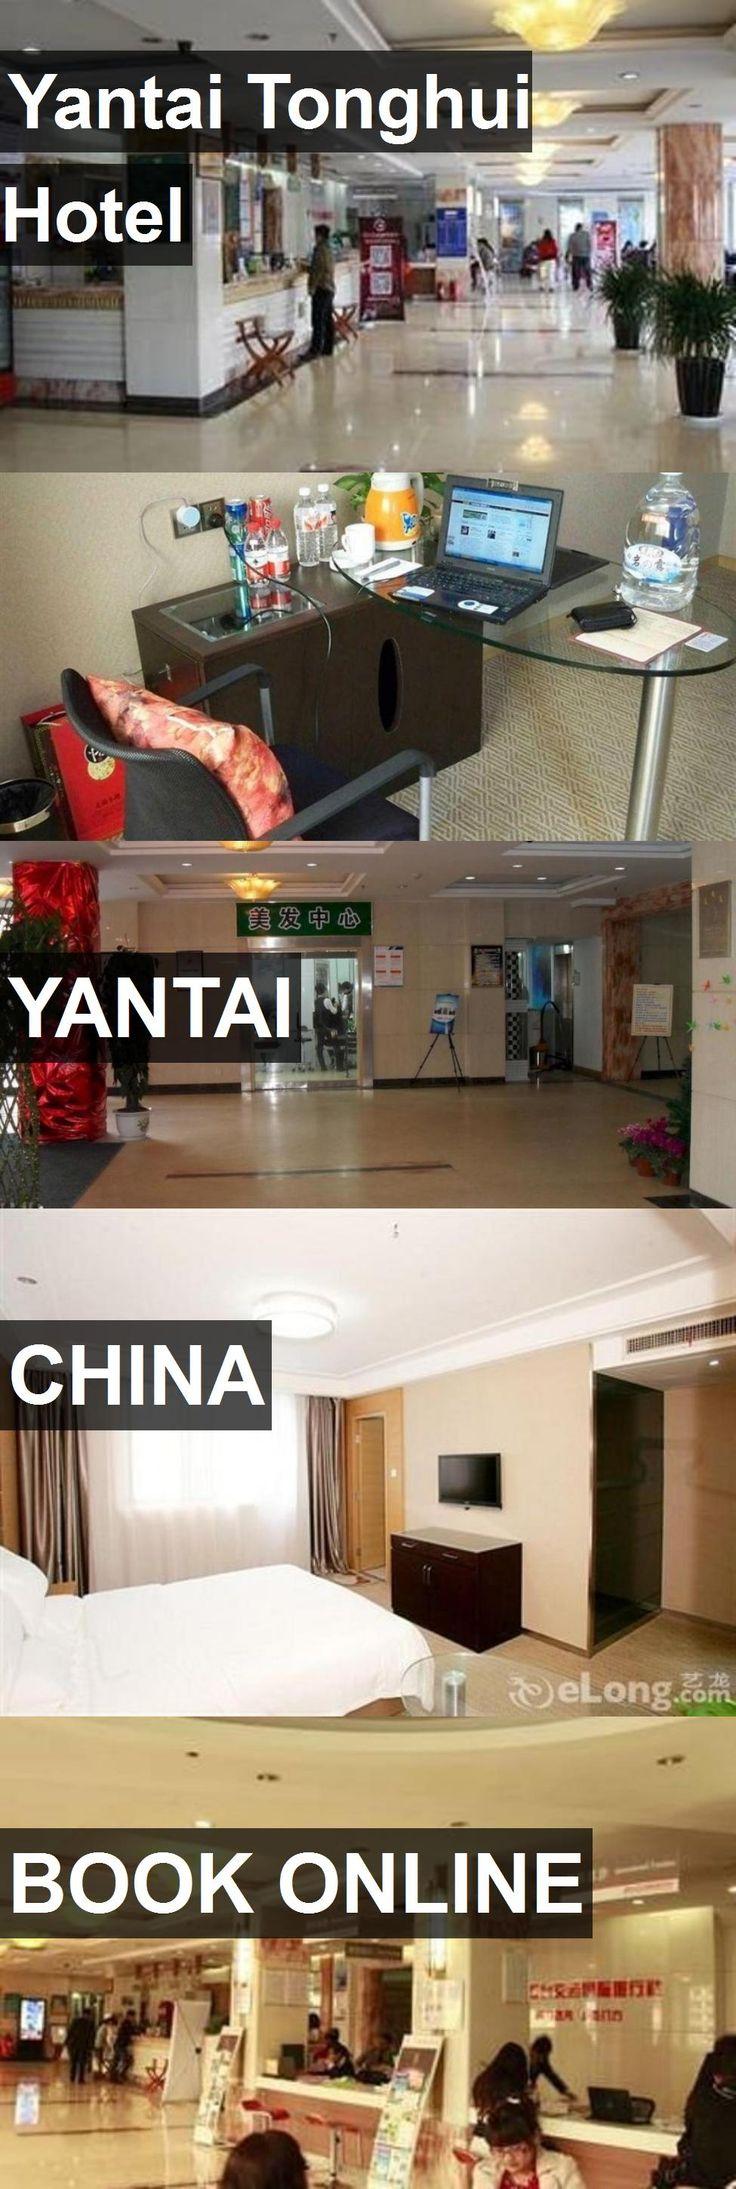 Hotel Yantai Tonghui Hotel in Yantai, China. For more information, photos, reviews and best prices please follow the link. #China #Yantai #YantaiTonghuiHotel #hotel #travel #vacation